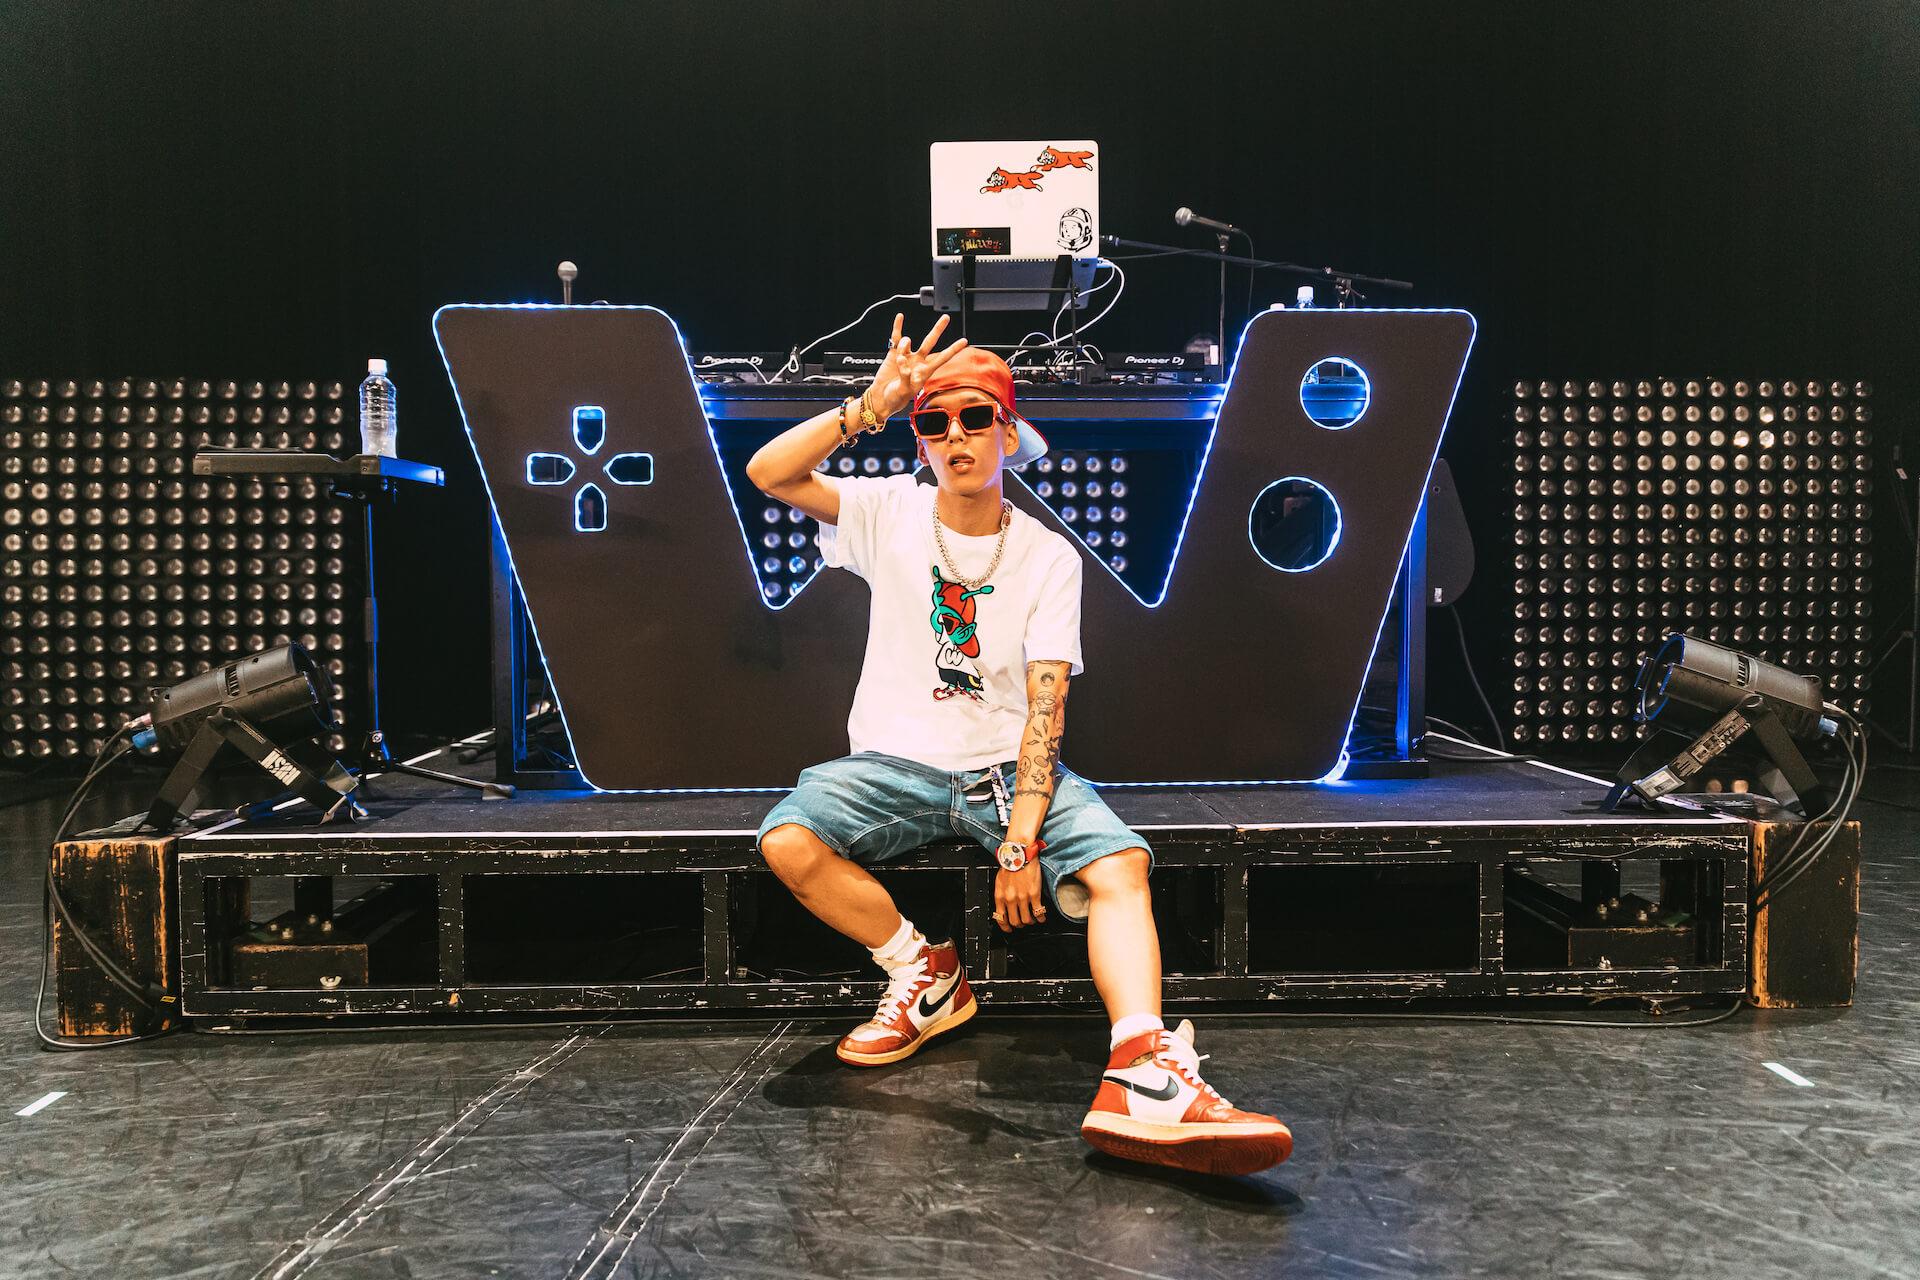 JP THE WAVYのクラブツアー東京公演がVISIONで開催決定!初のオンラインライブノーカット映像がZAIKOで独占配信中 music210621_jpthewavy_live_1